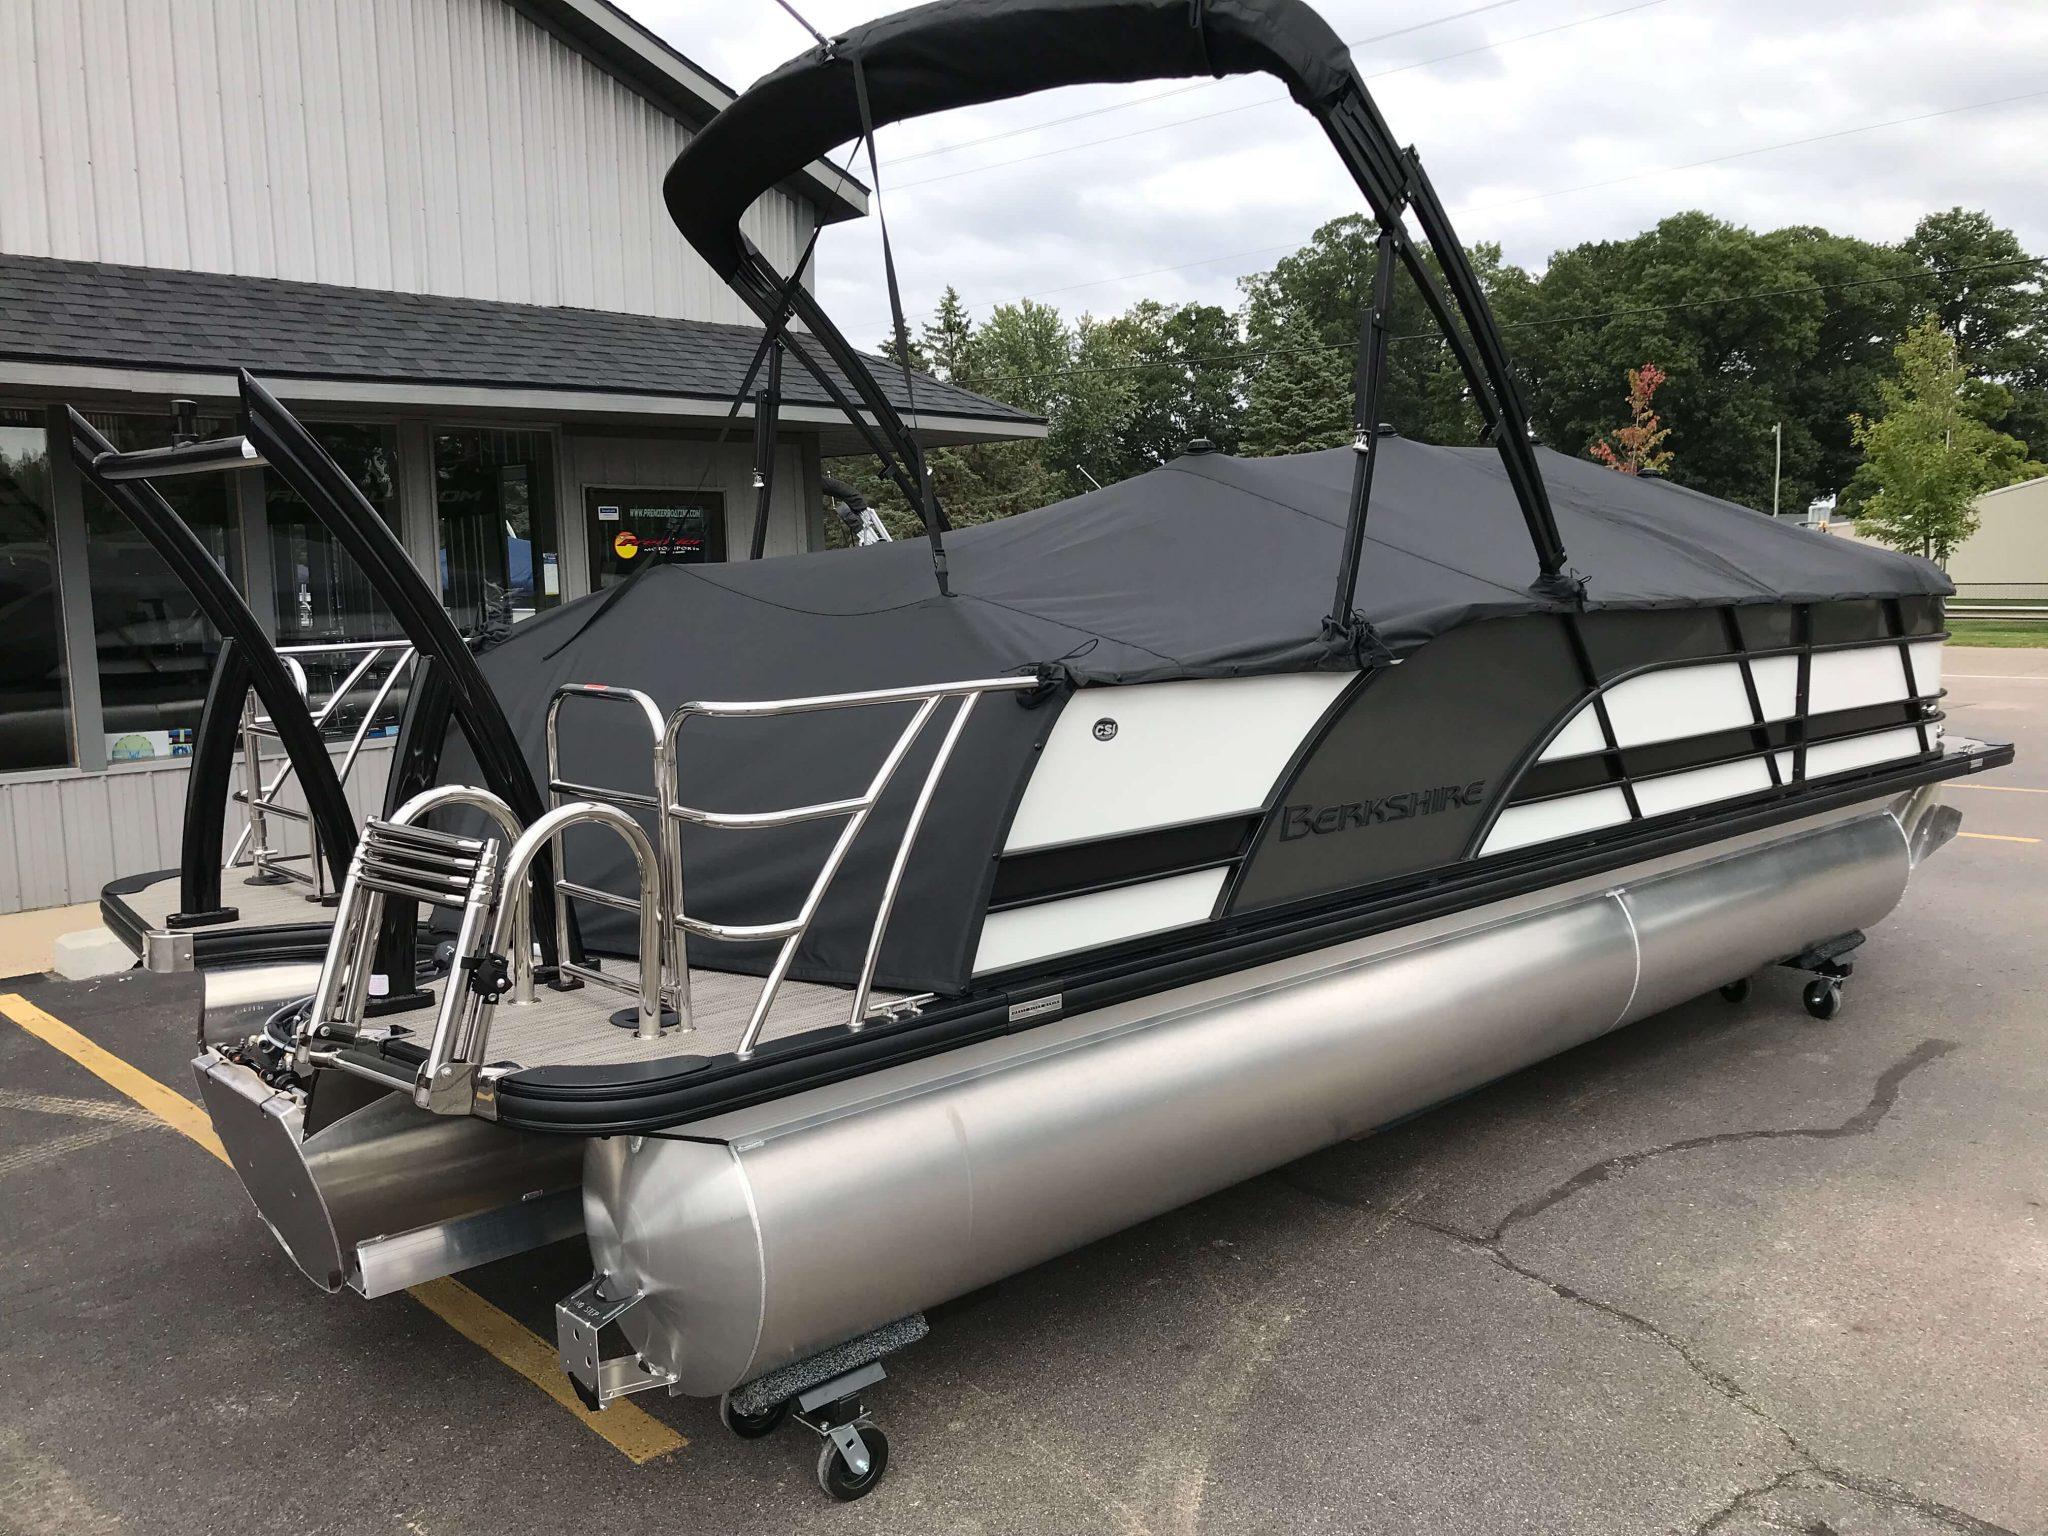 2019 Berkshire 23 SB2 STS Tritoon Full Mooring Cockpit Cover 2